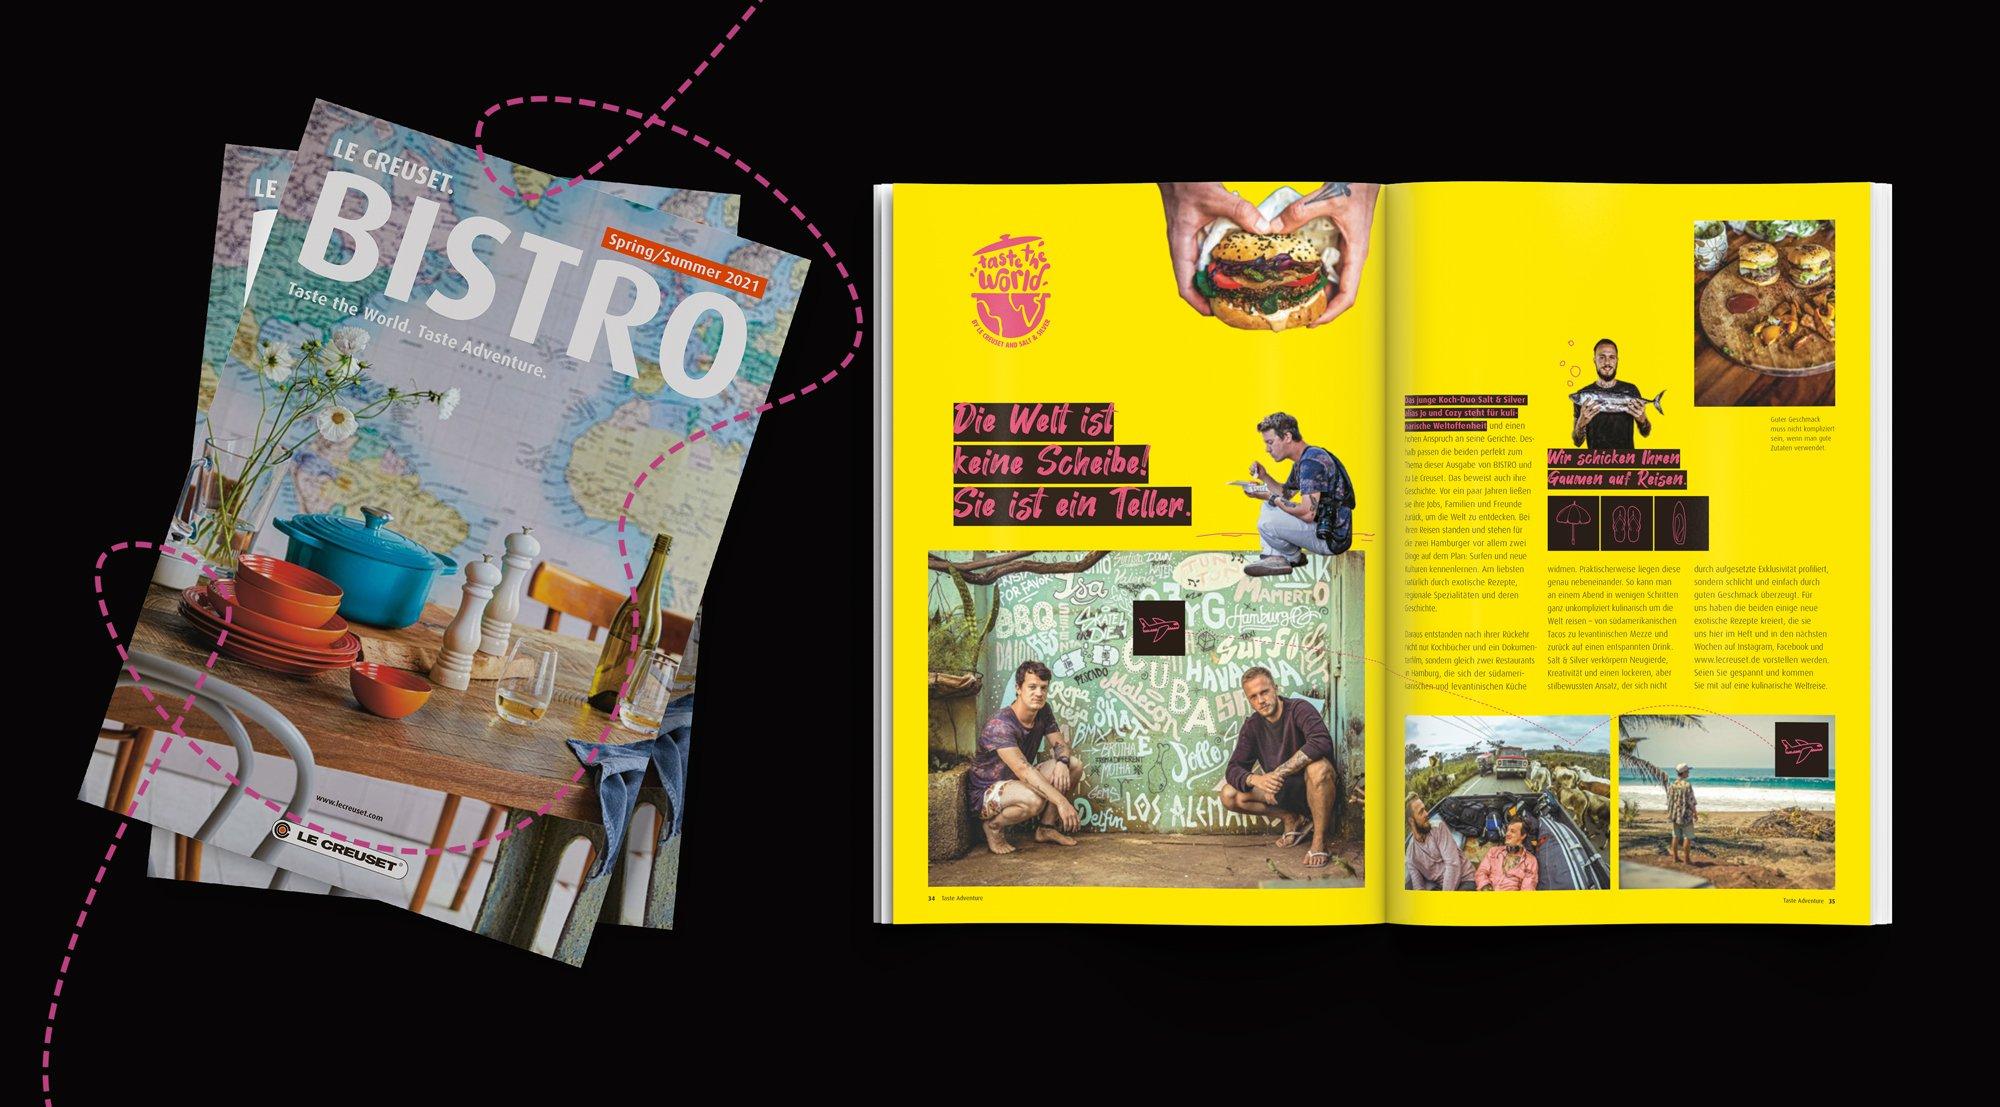 le-creuset-magazin-bistro-taste-the-world